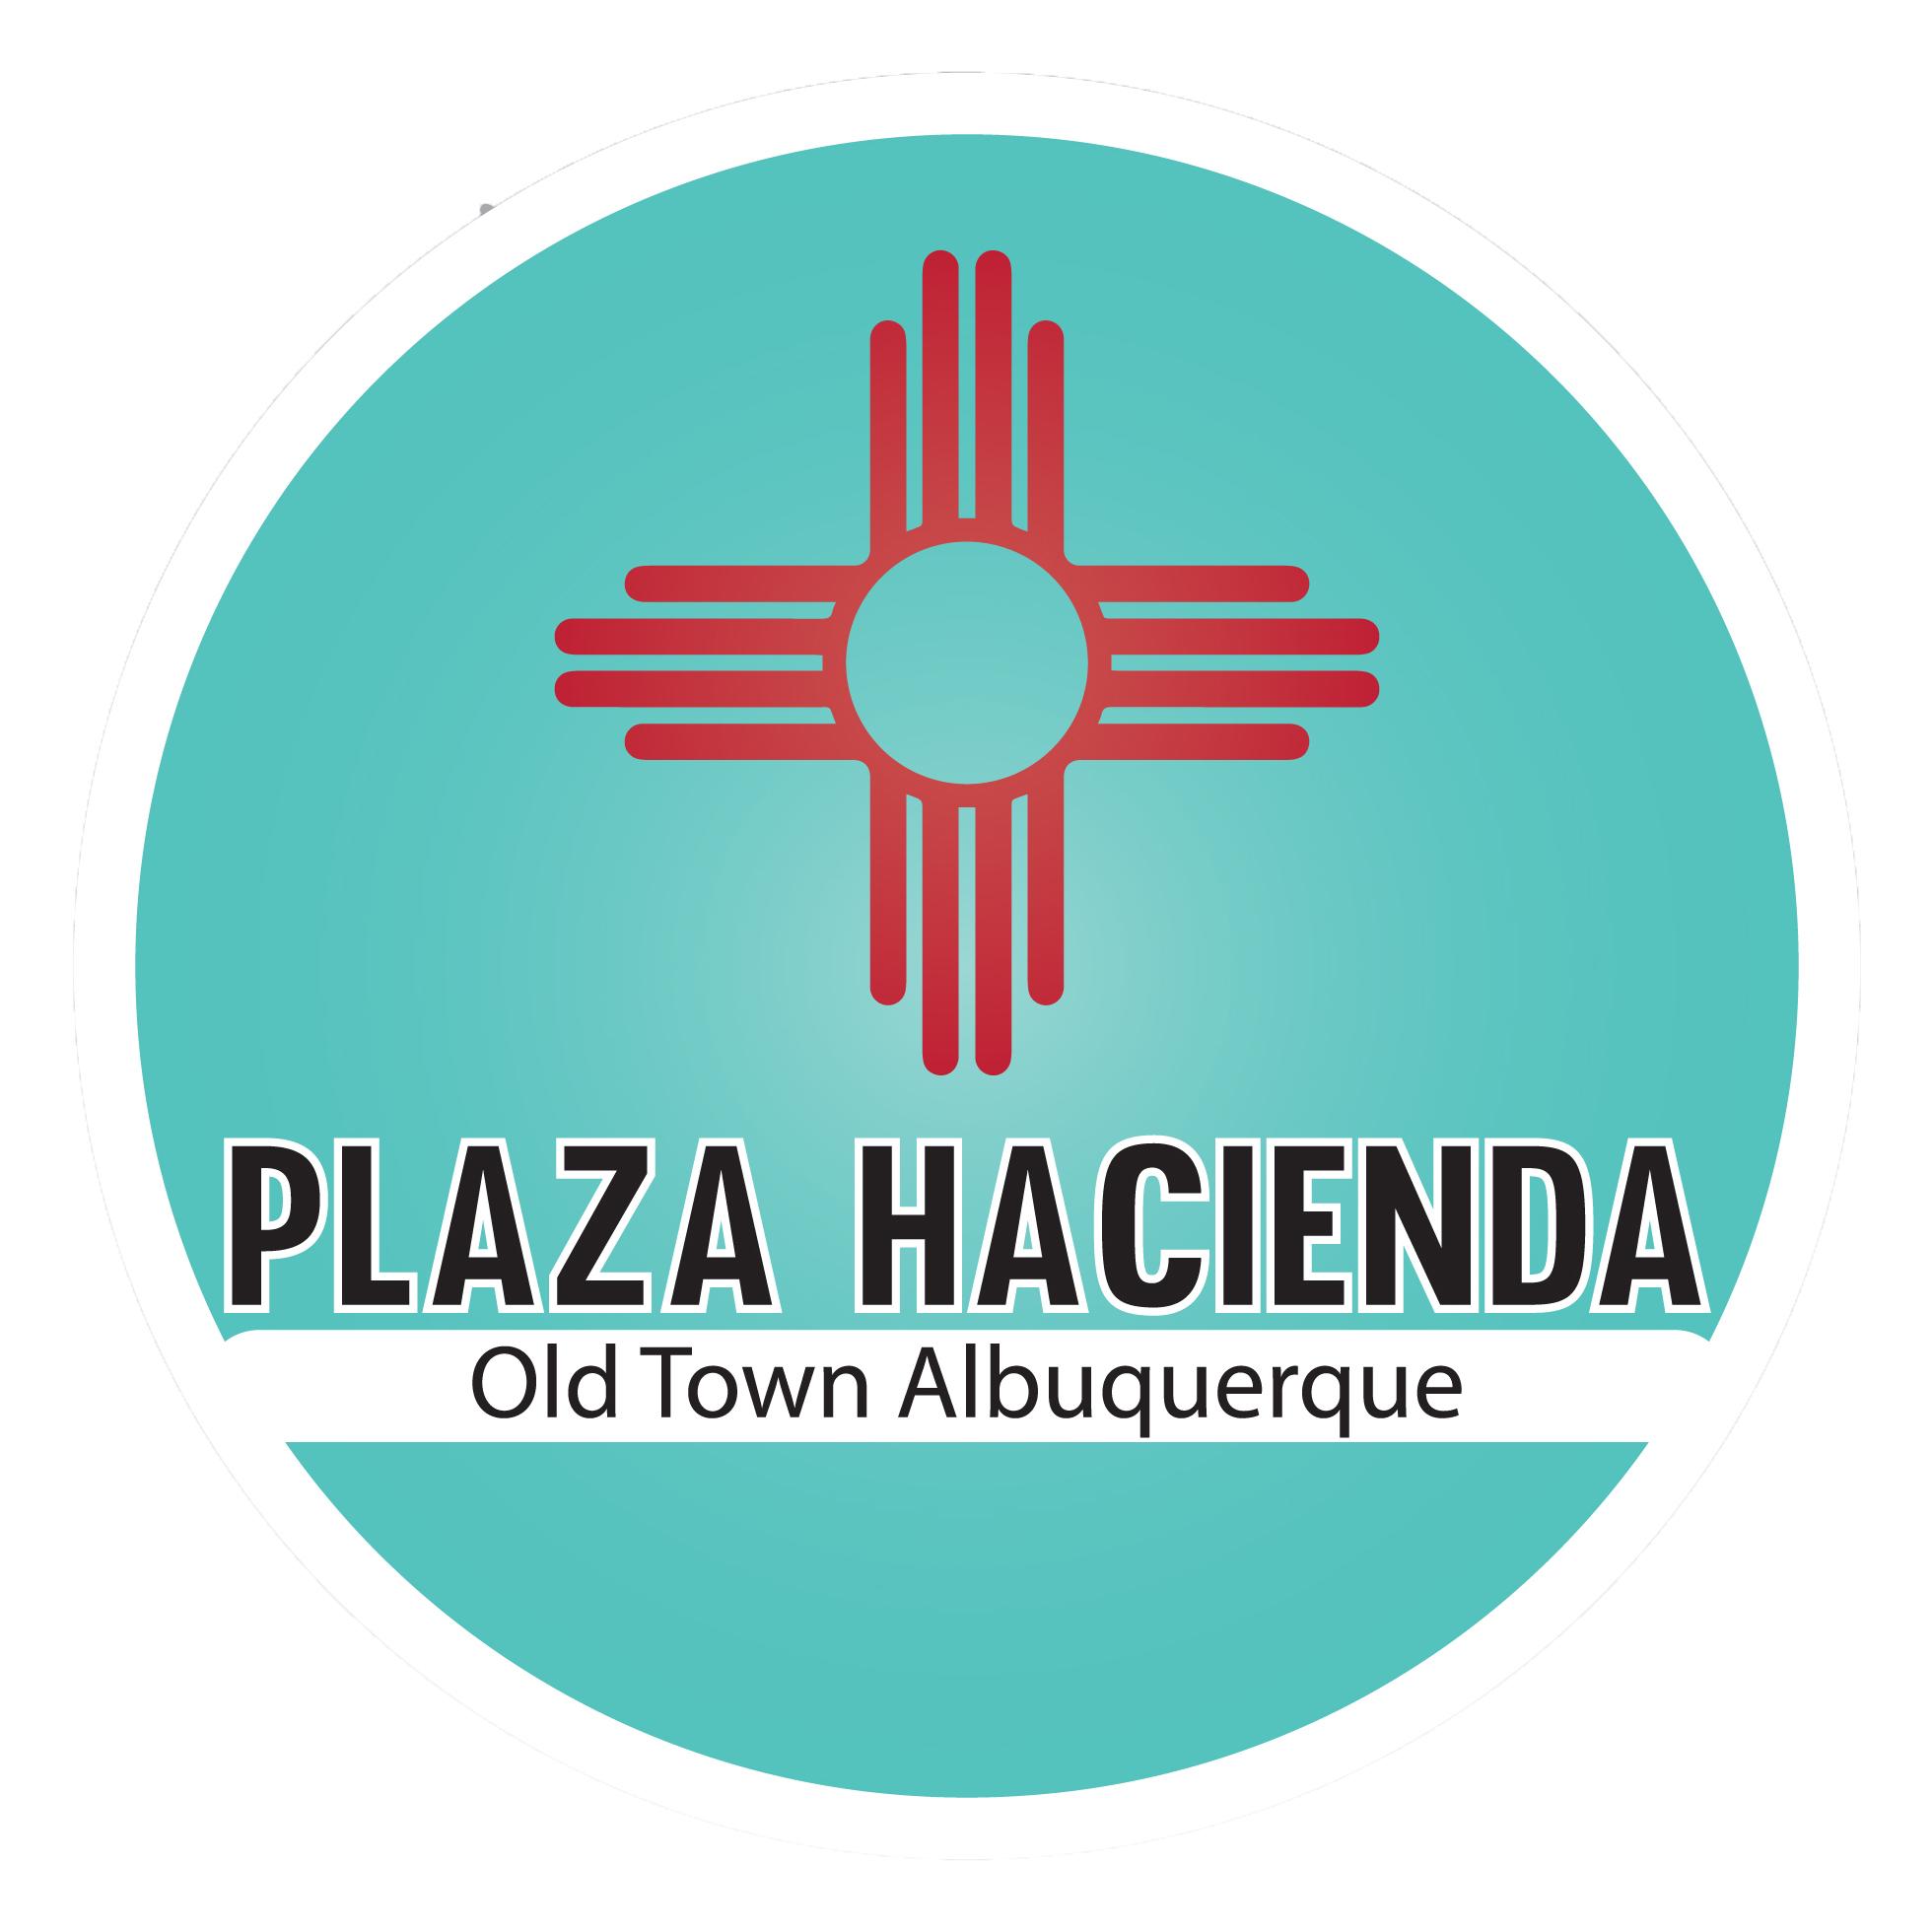 Social media plaza hacienda in old town albuquerque for Thunderbird jewelry albuquerque new mexico